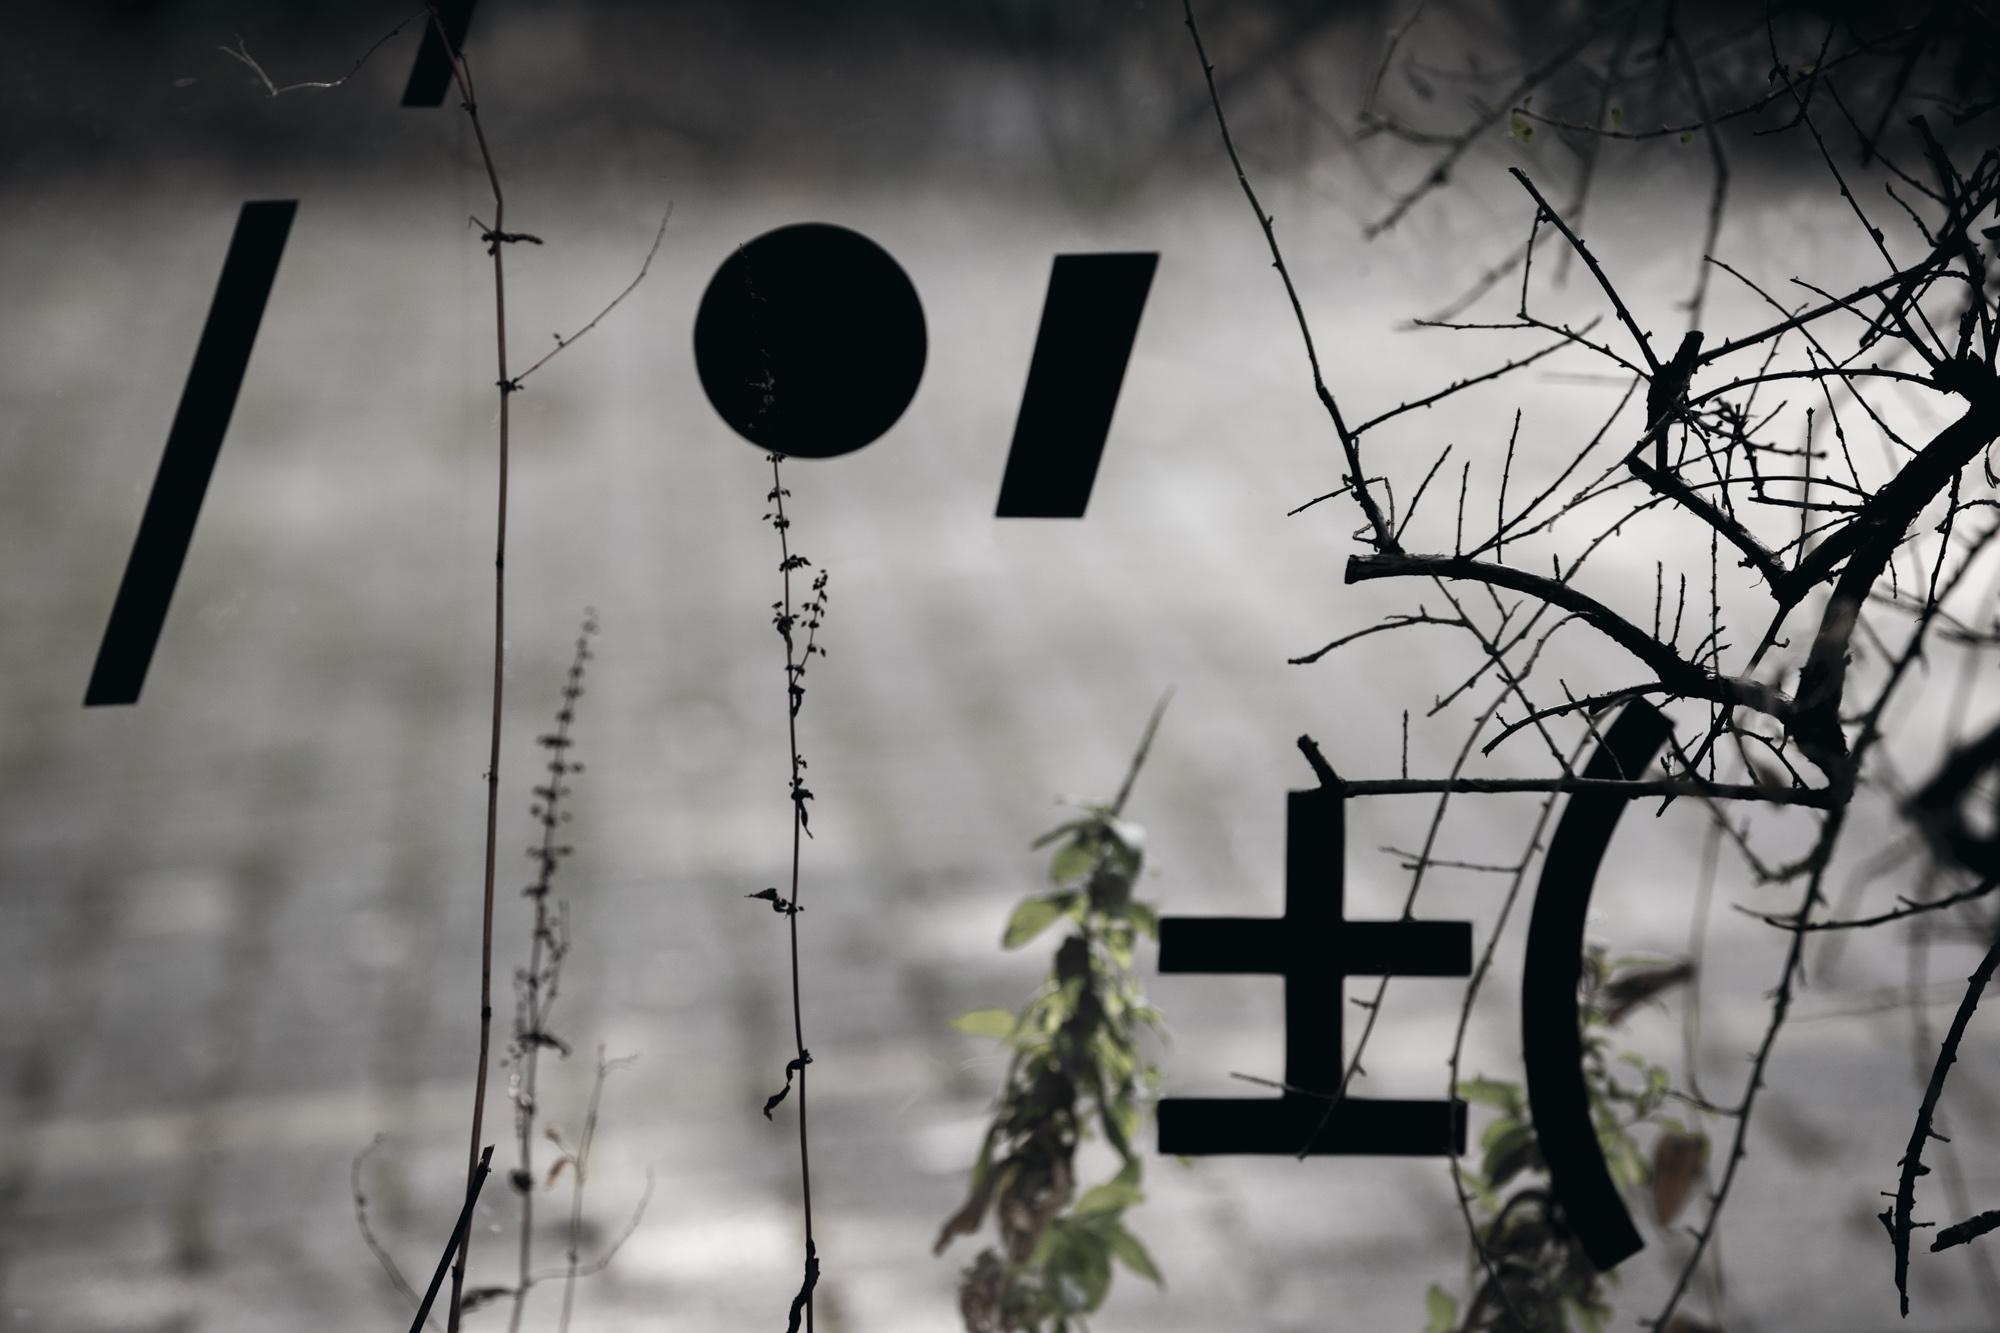 RRodner-Dichotomies-Code landscapes-12.jpg